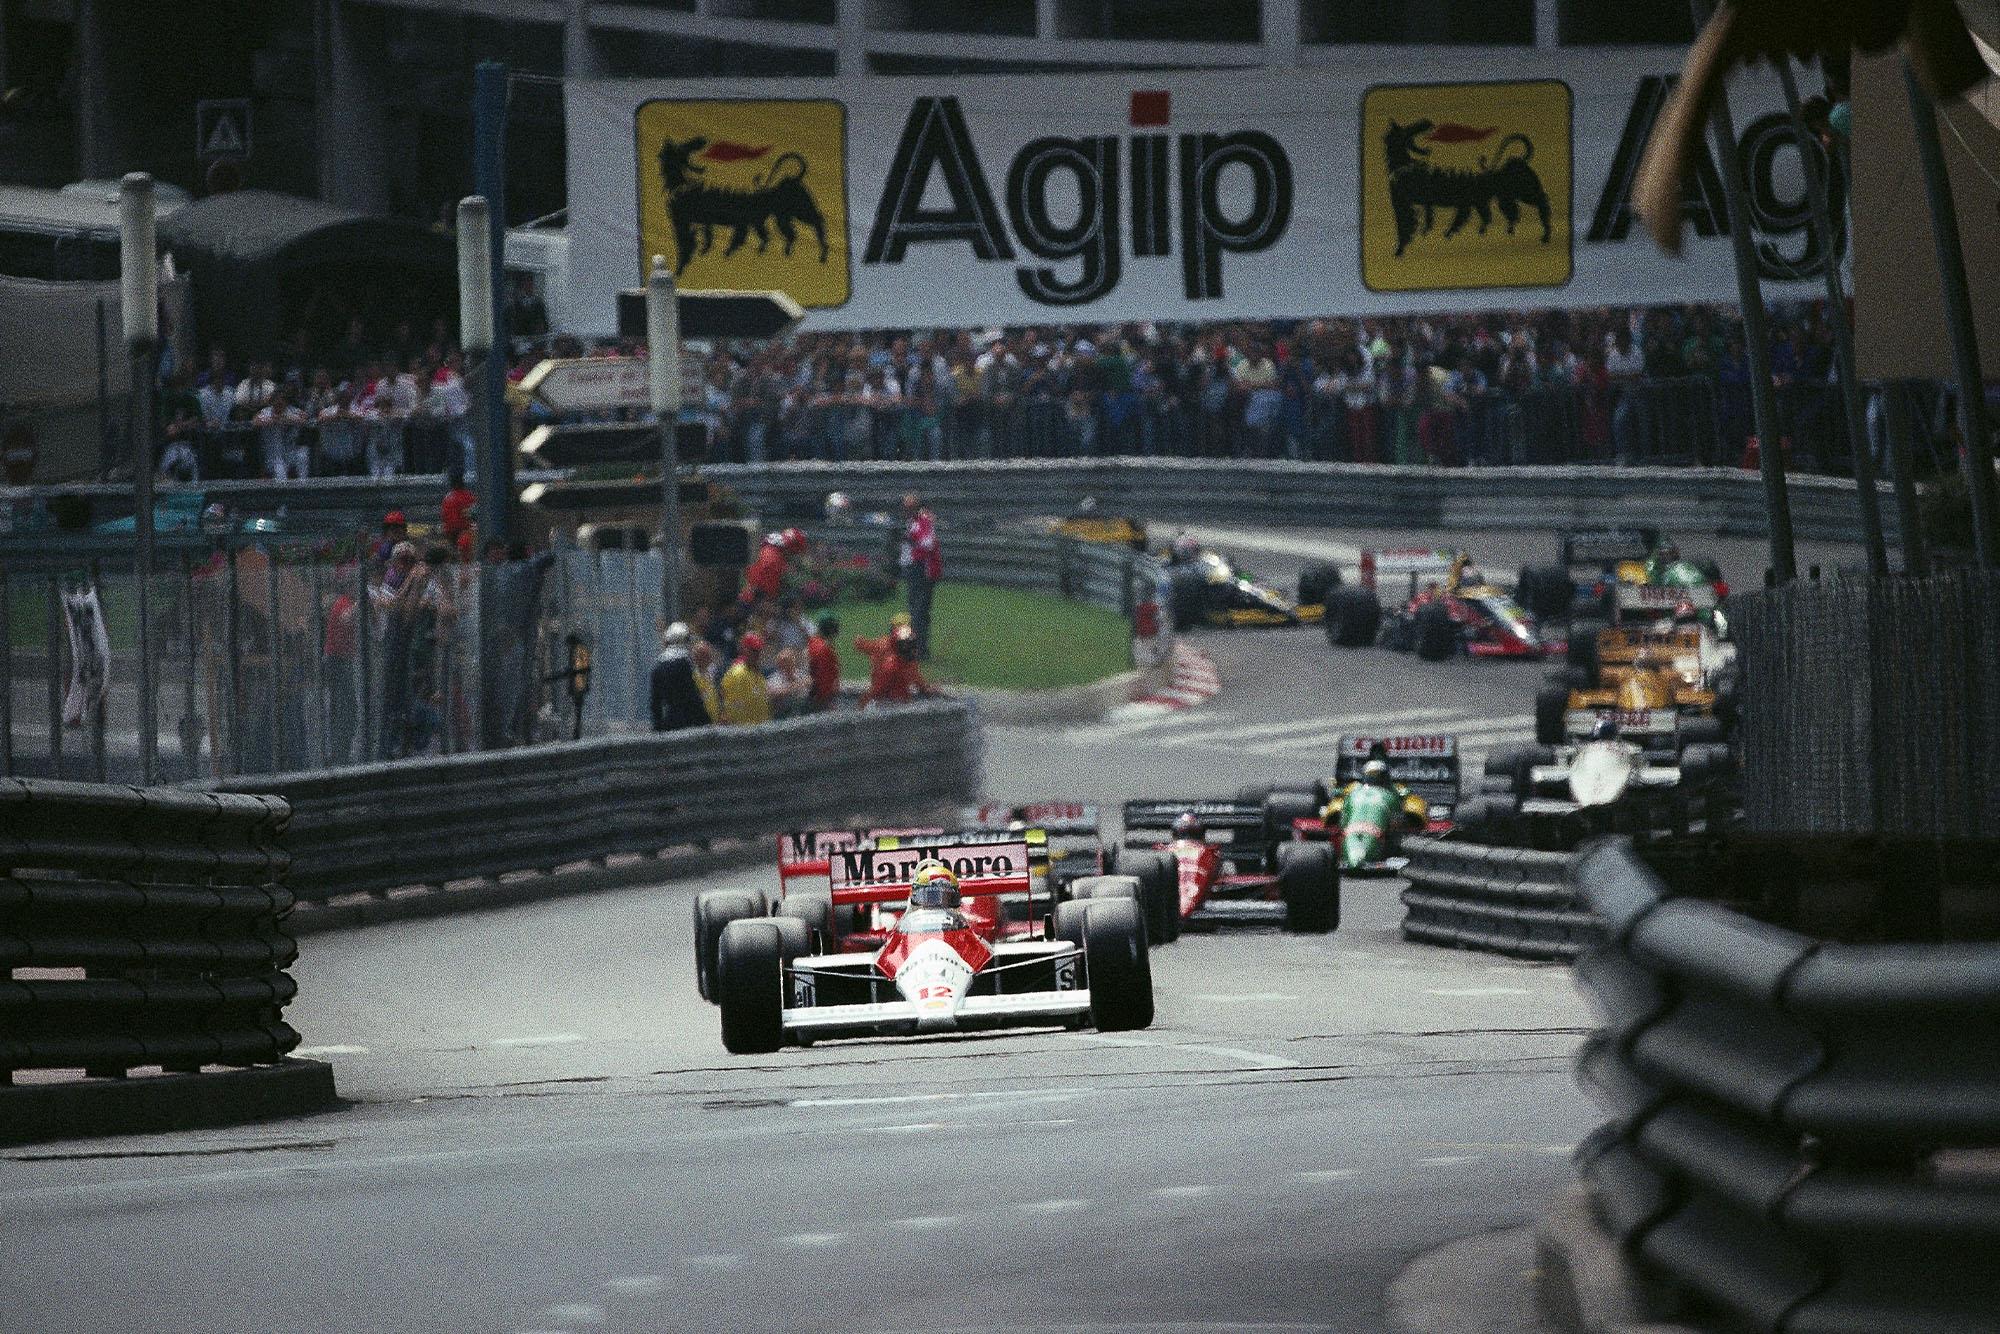 1988 MON GP start